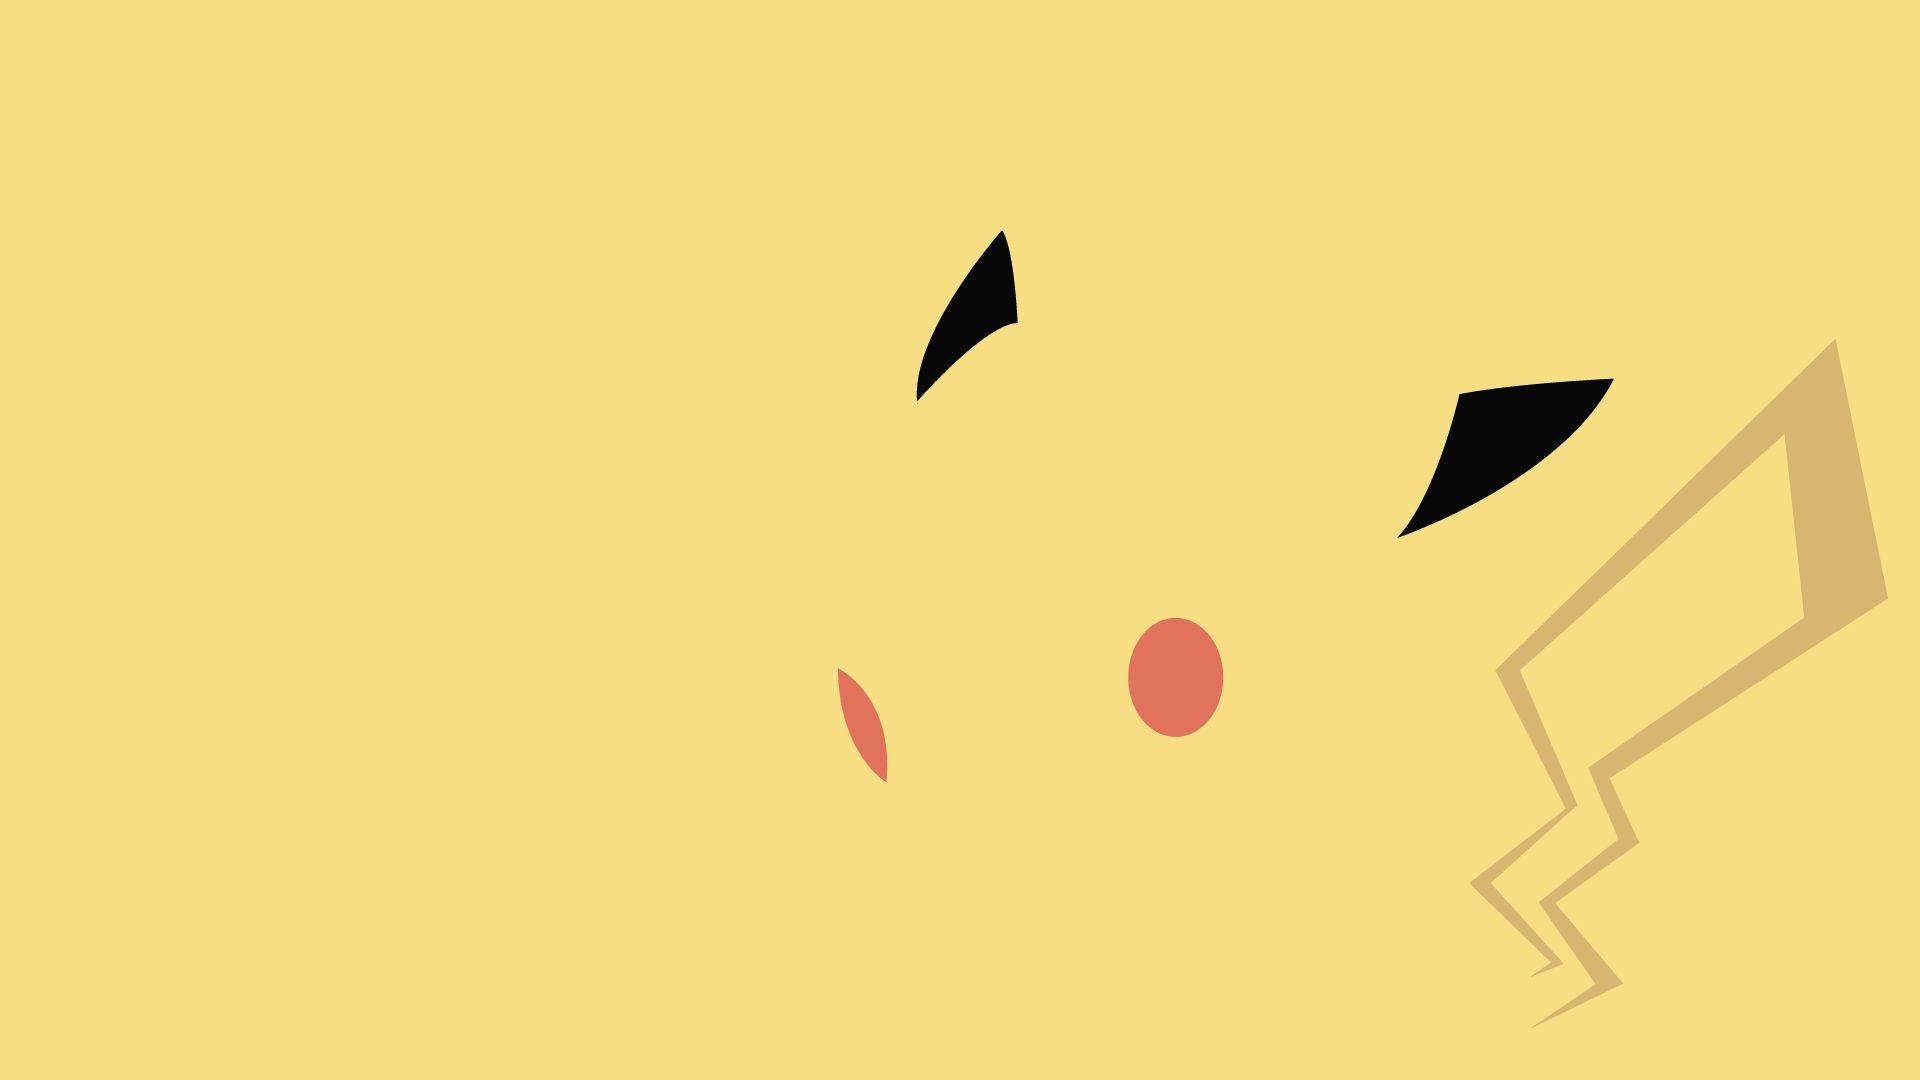 Minimalist Pokemon Wallpapers 39105 Hd Wallpapers Pokemon Perla Y Diamante Pokemon Perla Pokemon